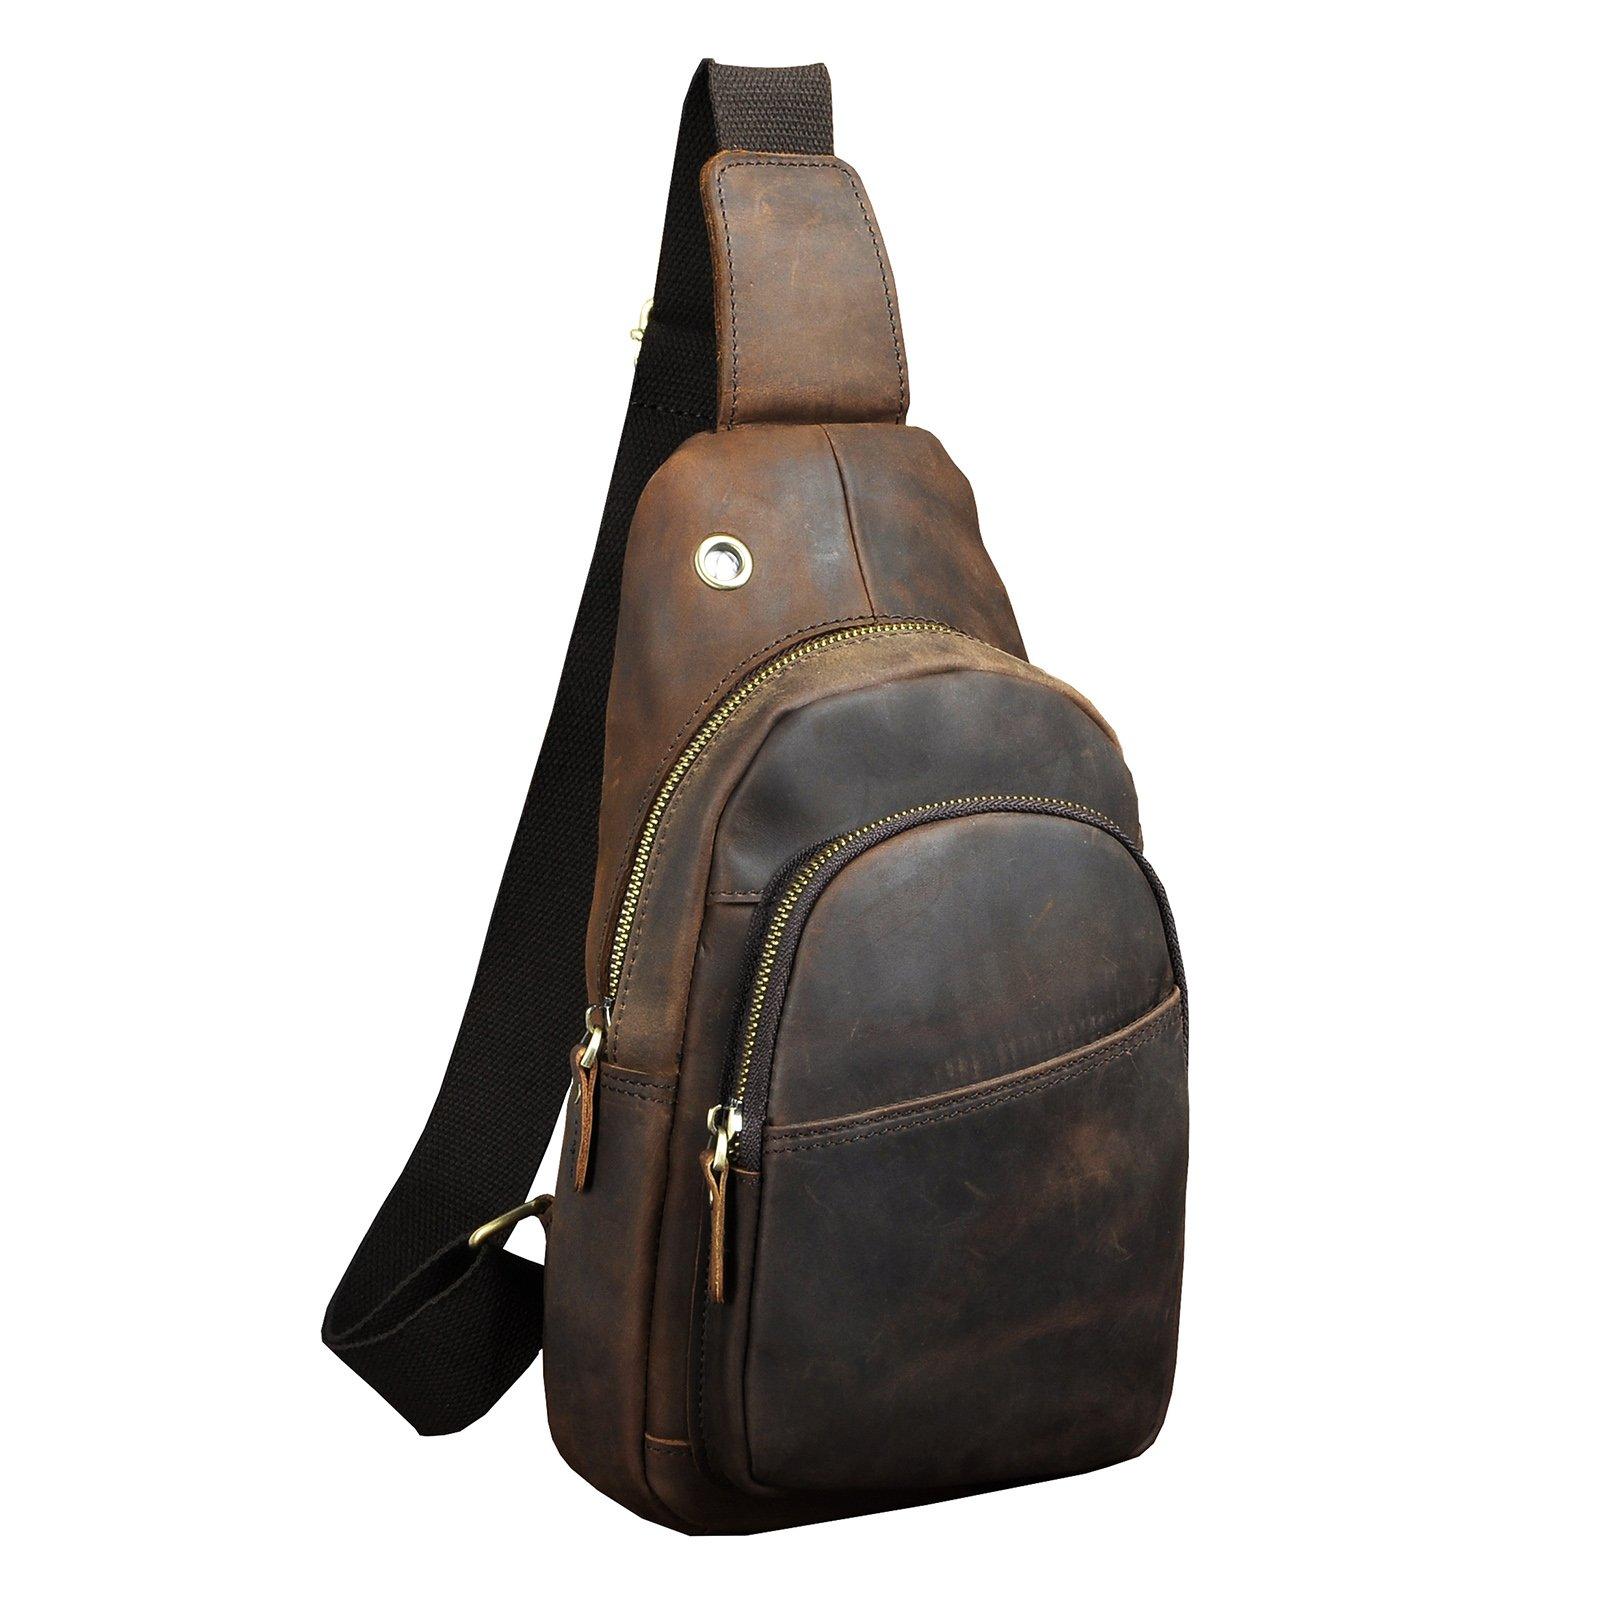 Le'aokuu Mens Outdoor Casual Tea Travel Hiking Crossbody Chest Sling Bag Rig One Shoulder Strap Bag Backpack Men Leather (X 008 dark brown 2)